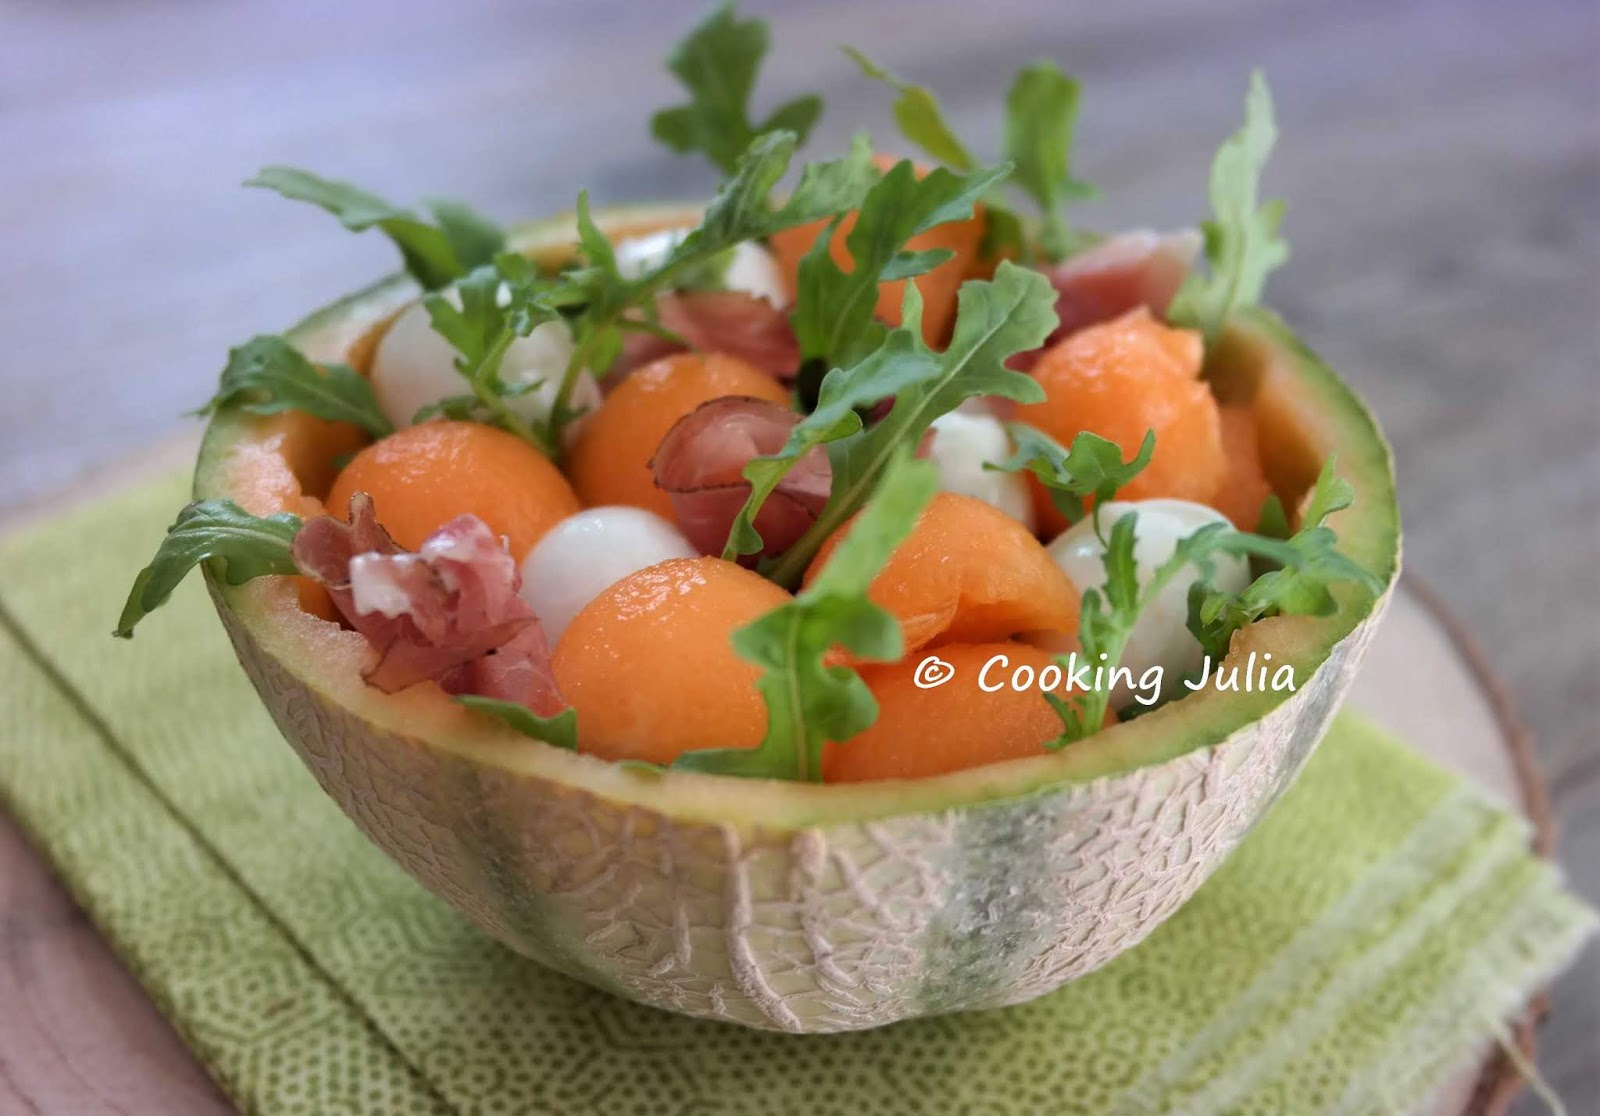 Cooking Julia Melon Garni A L Italienne